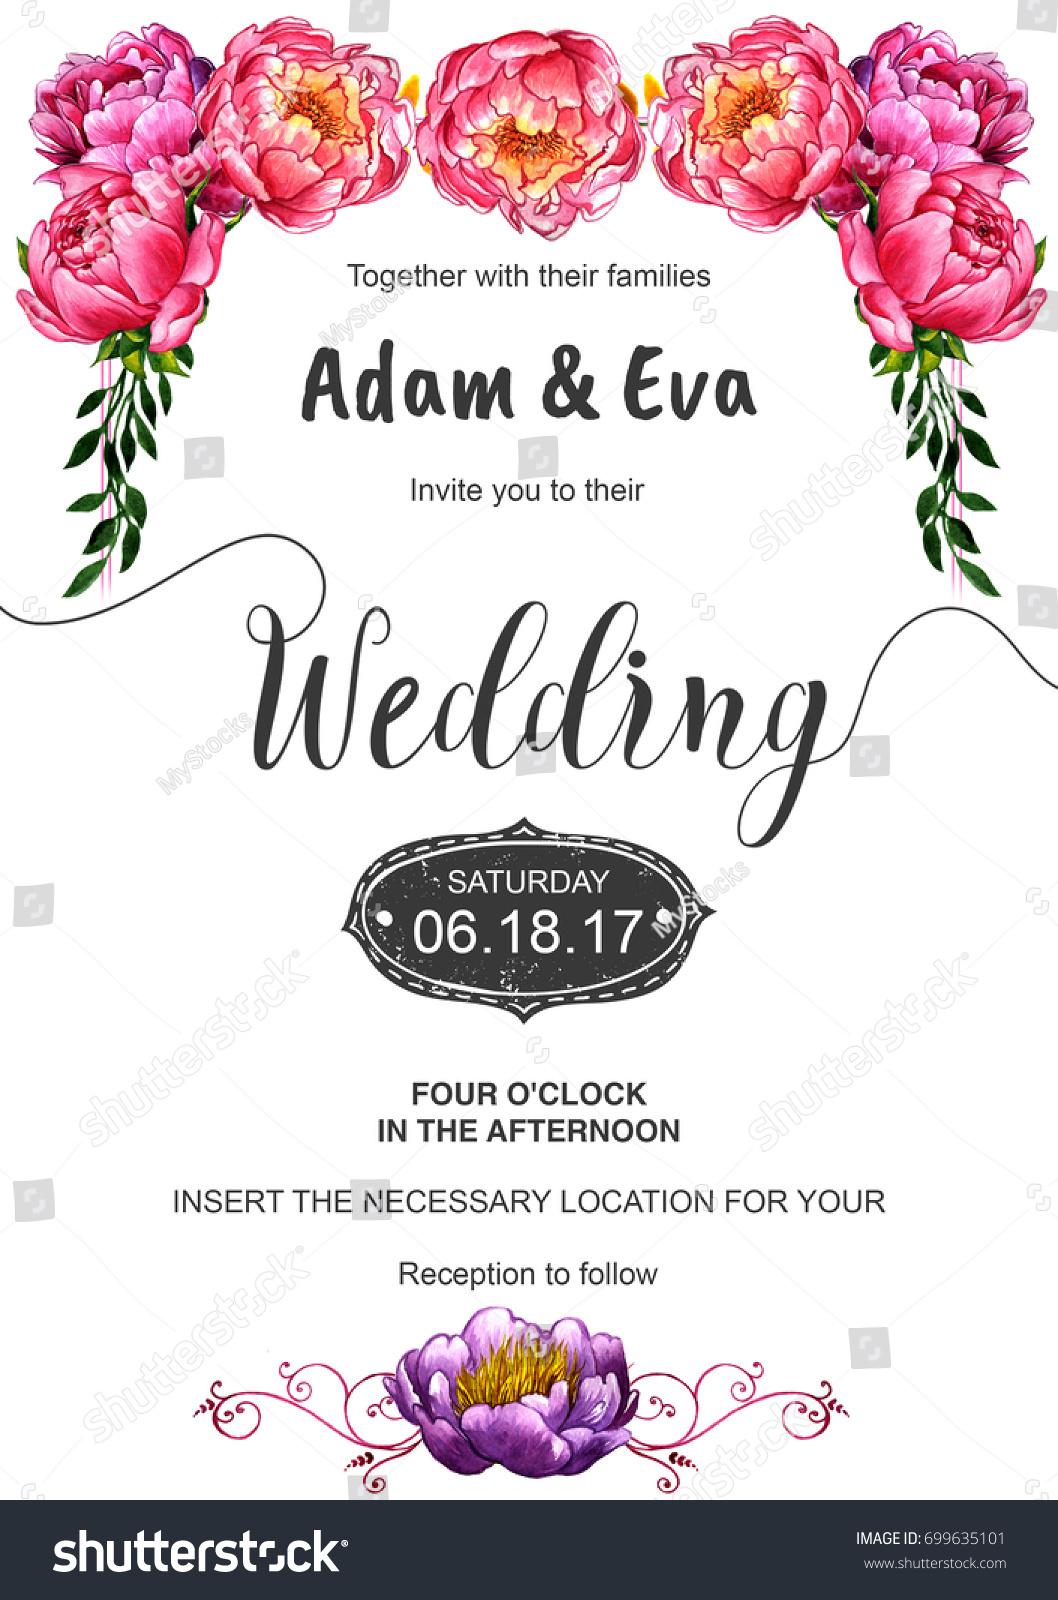 Wedding Invitation Di Y Template Handmade Watercolor Stock ...